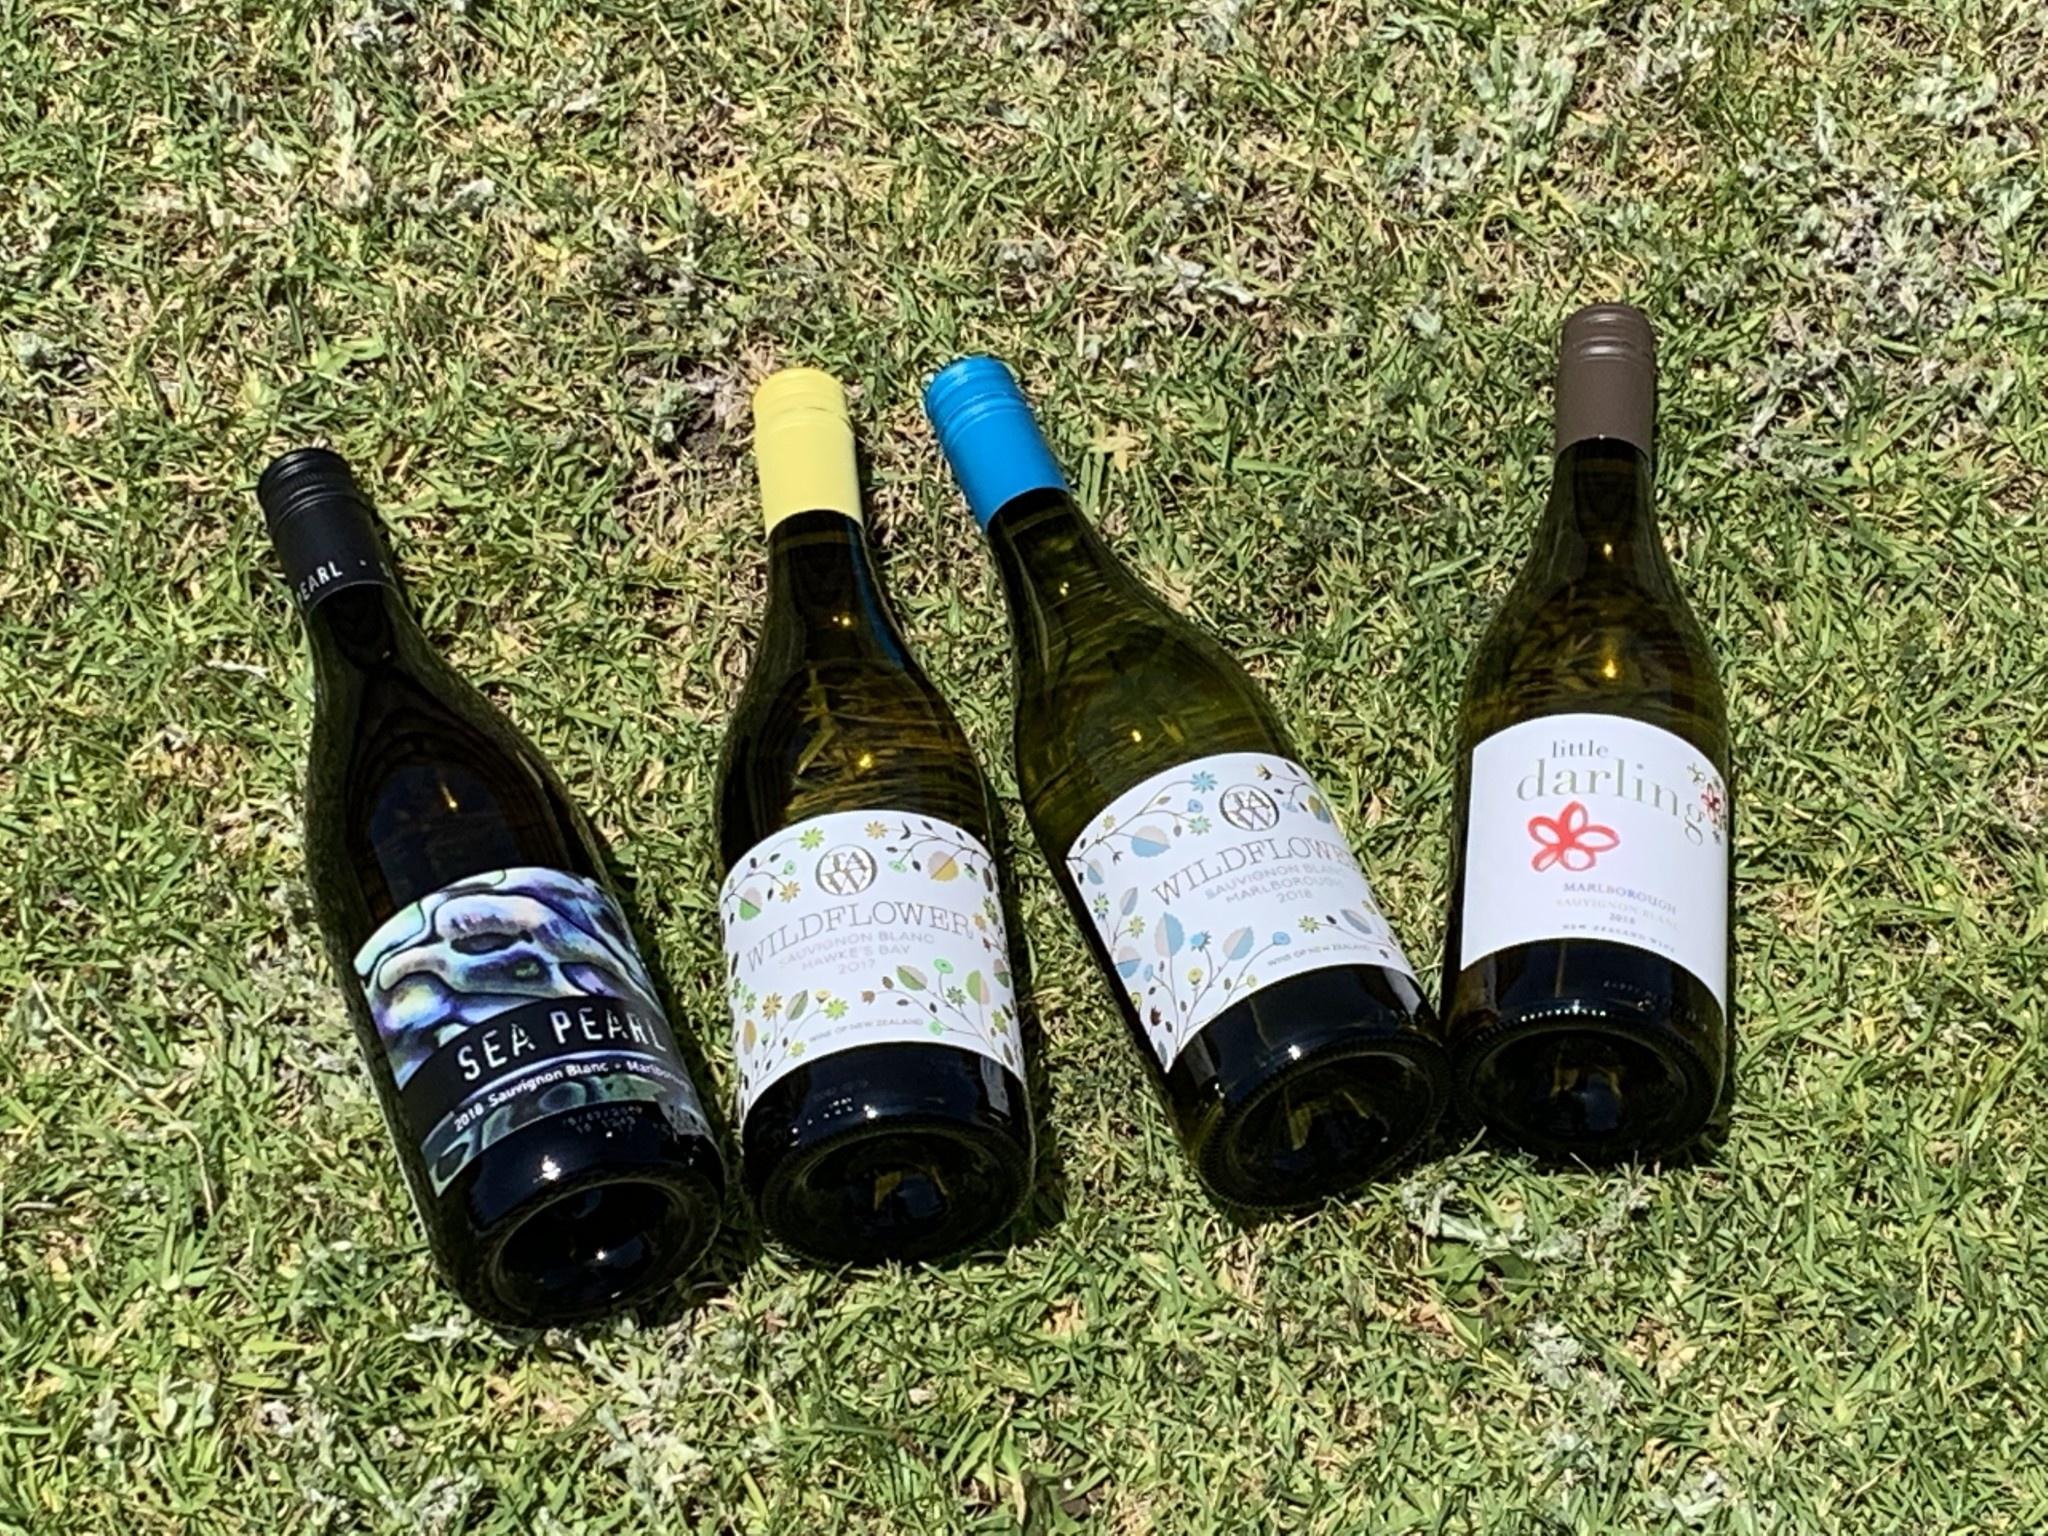 New Zealand Sauvignon Blanc 4 Pack!